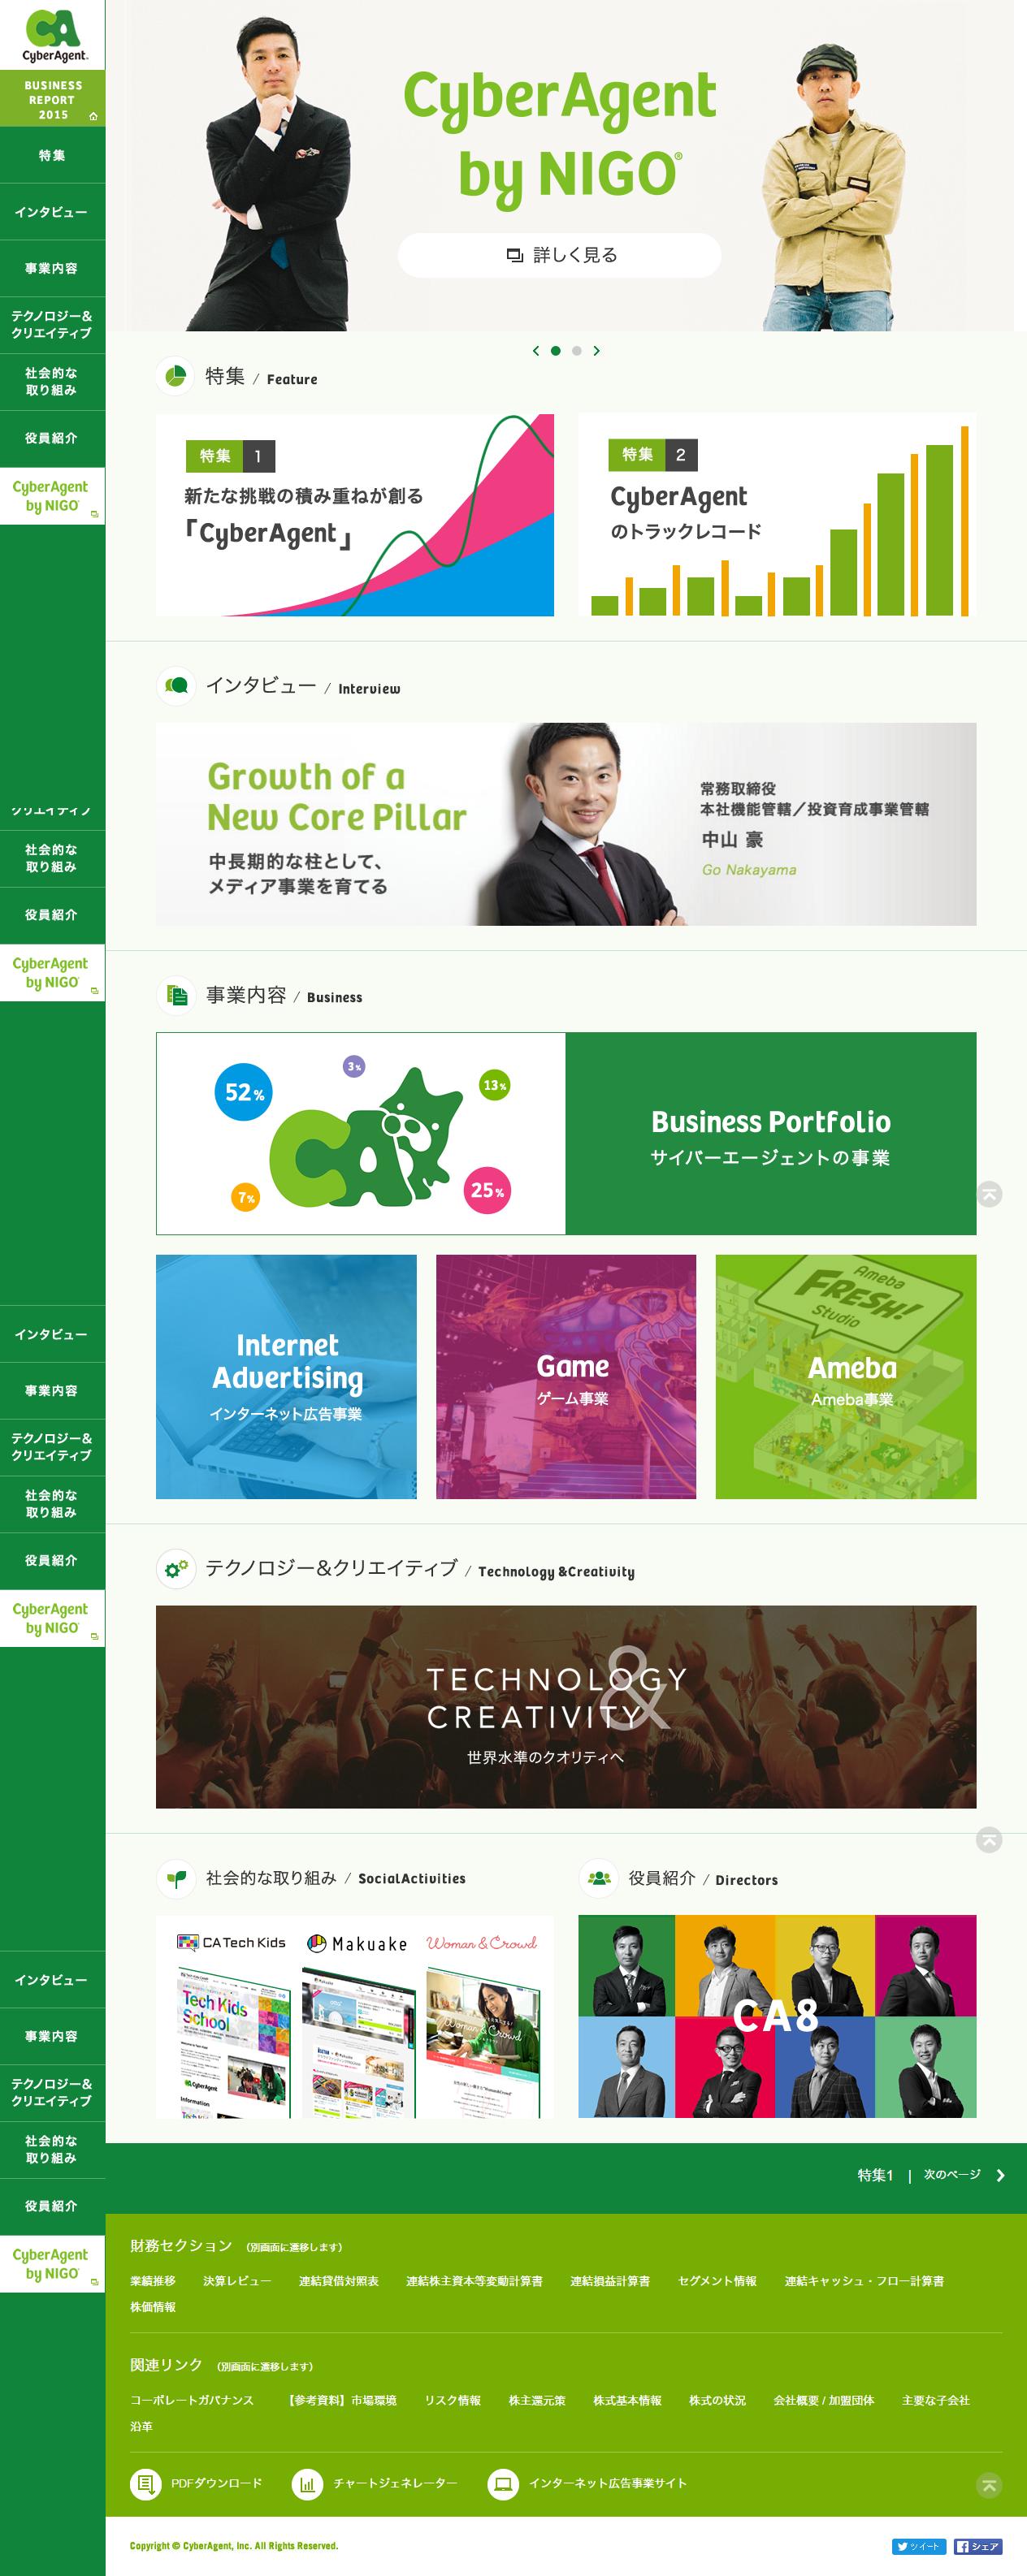 https://www.cyberagent.co.jp/ir/special/business_report/2015/